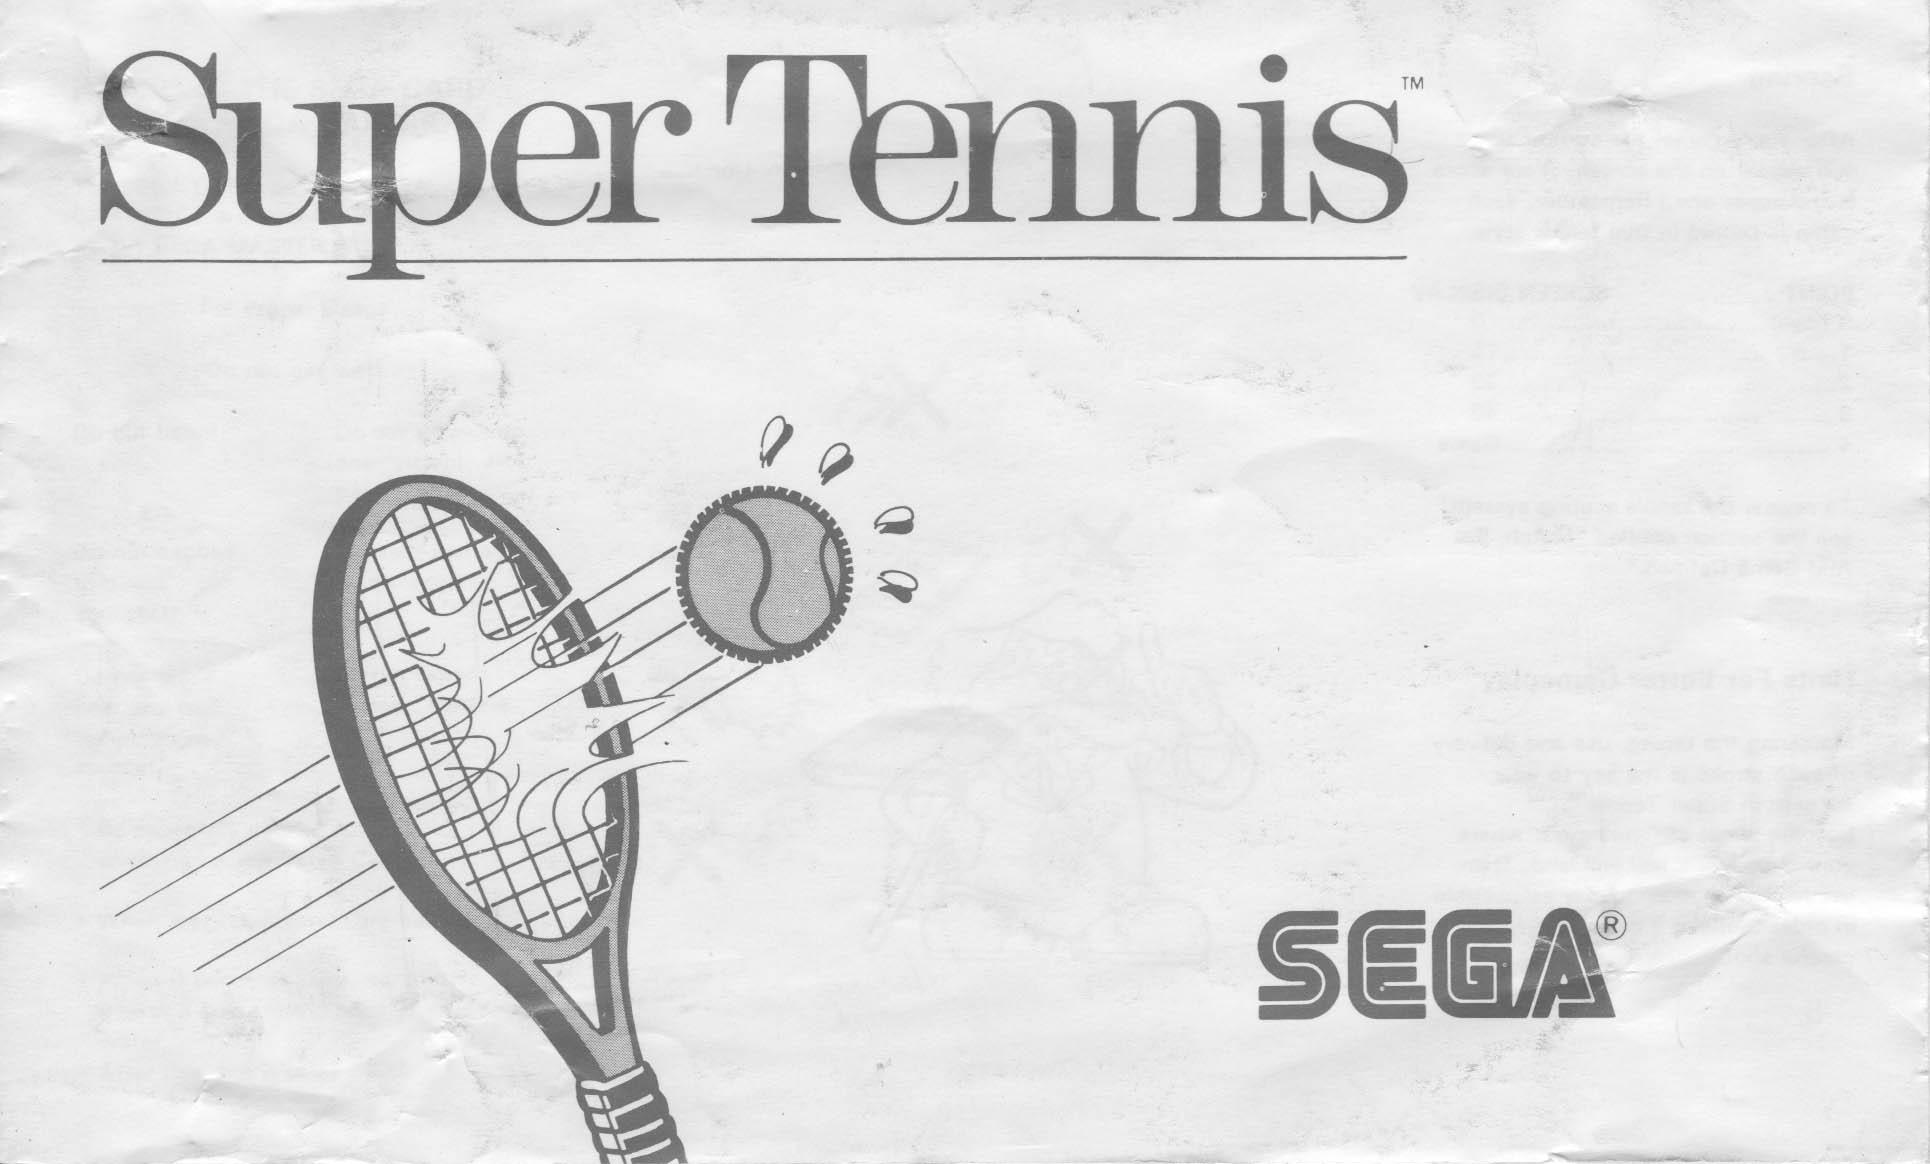 Super Tennis (スーパーテニス) / Great Tennis (グレートテニス